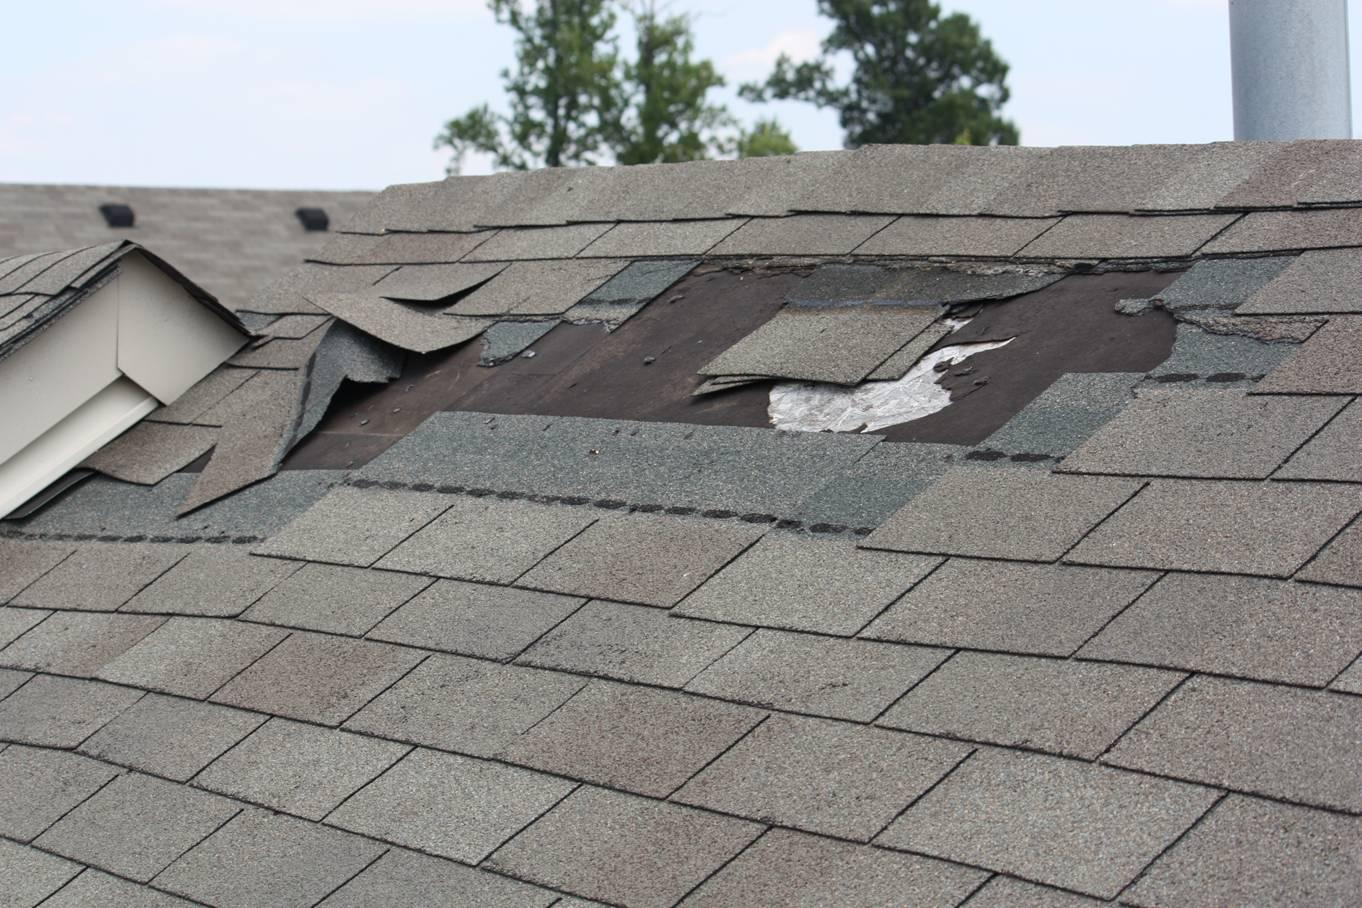 Repairing Damaged Roof Tiles